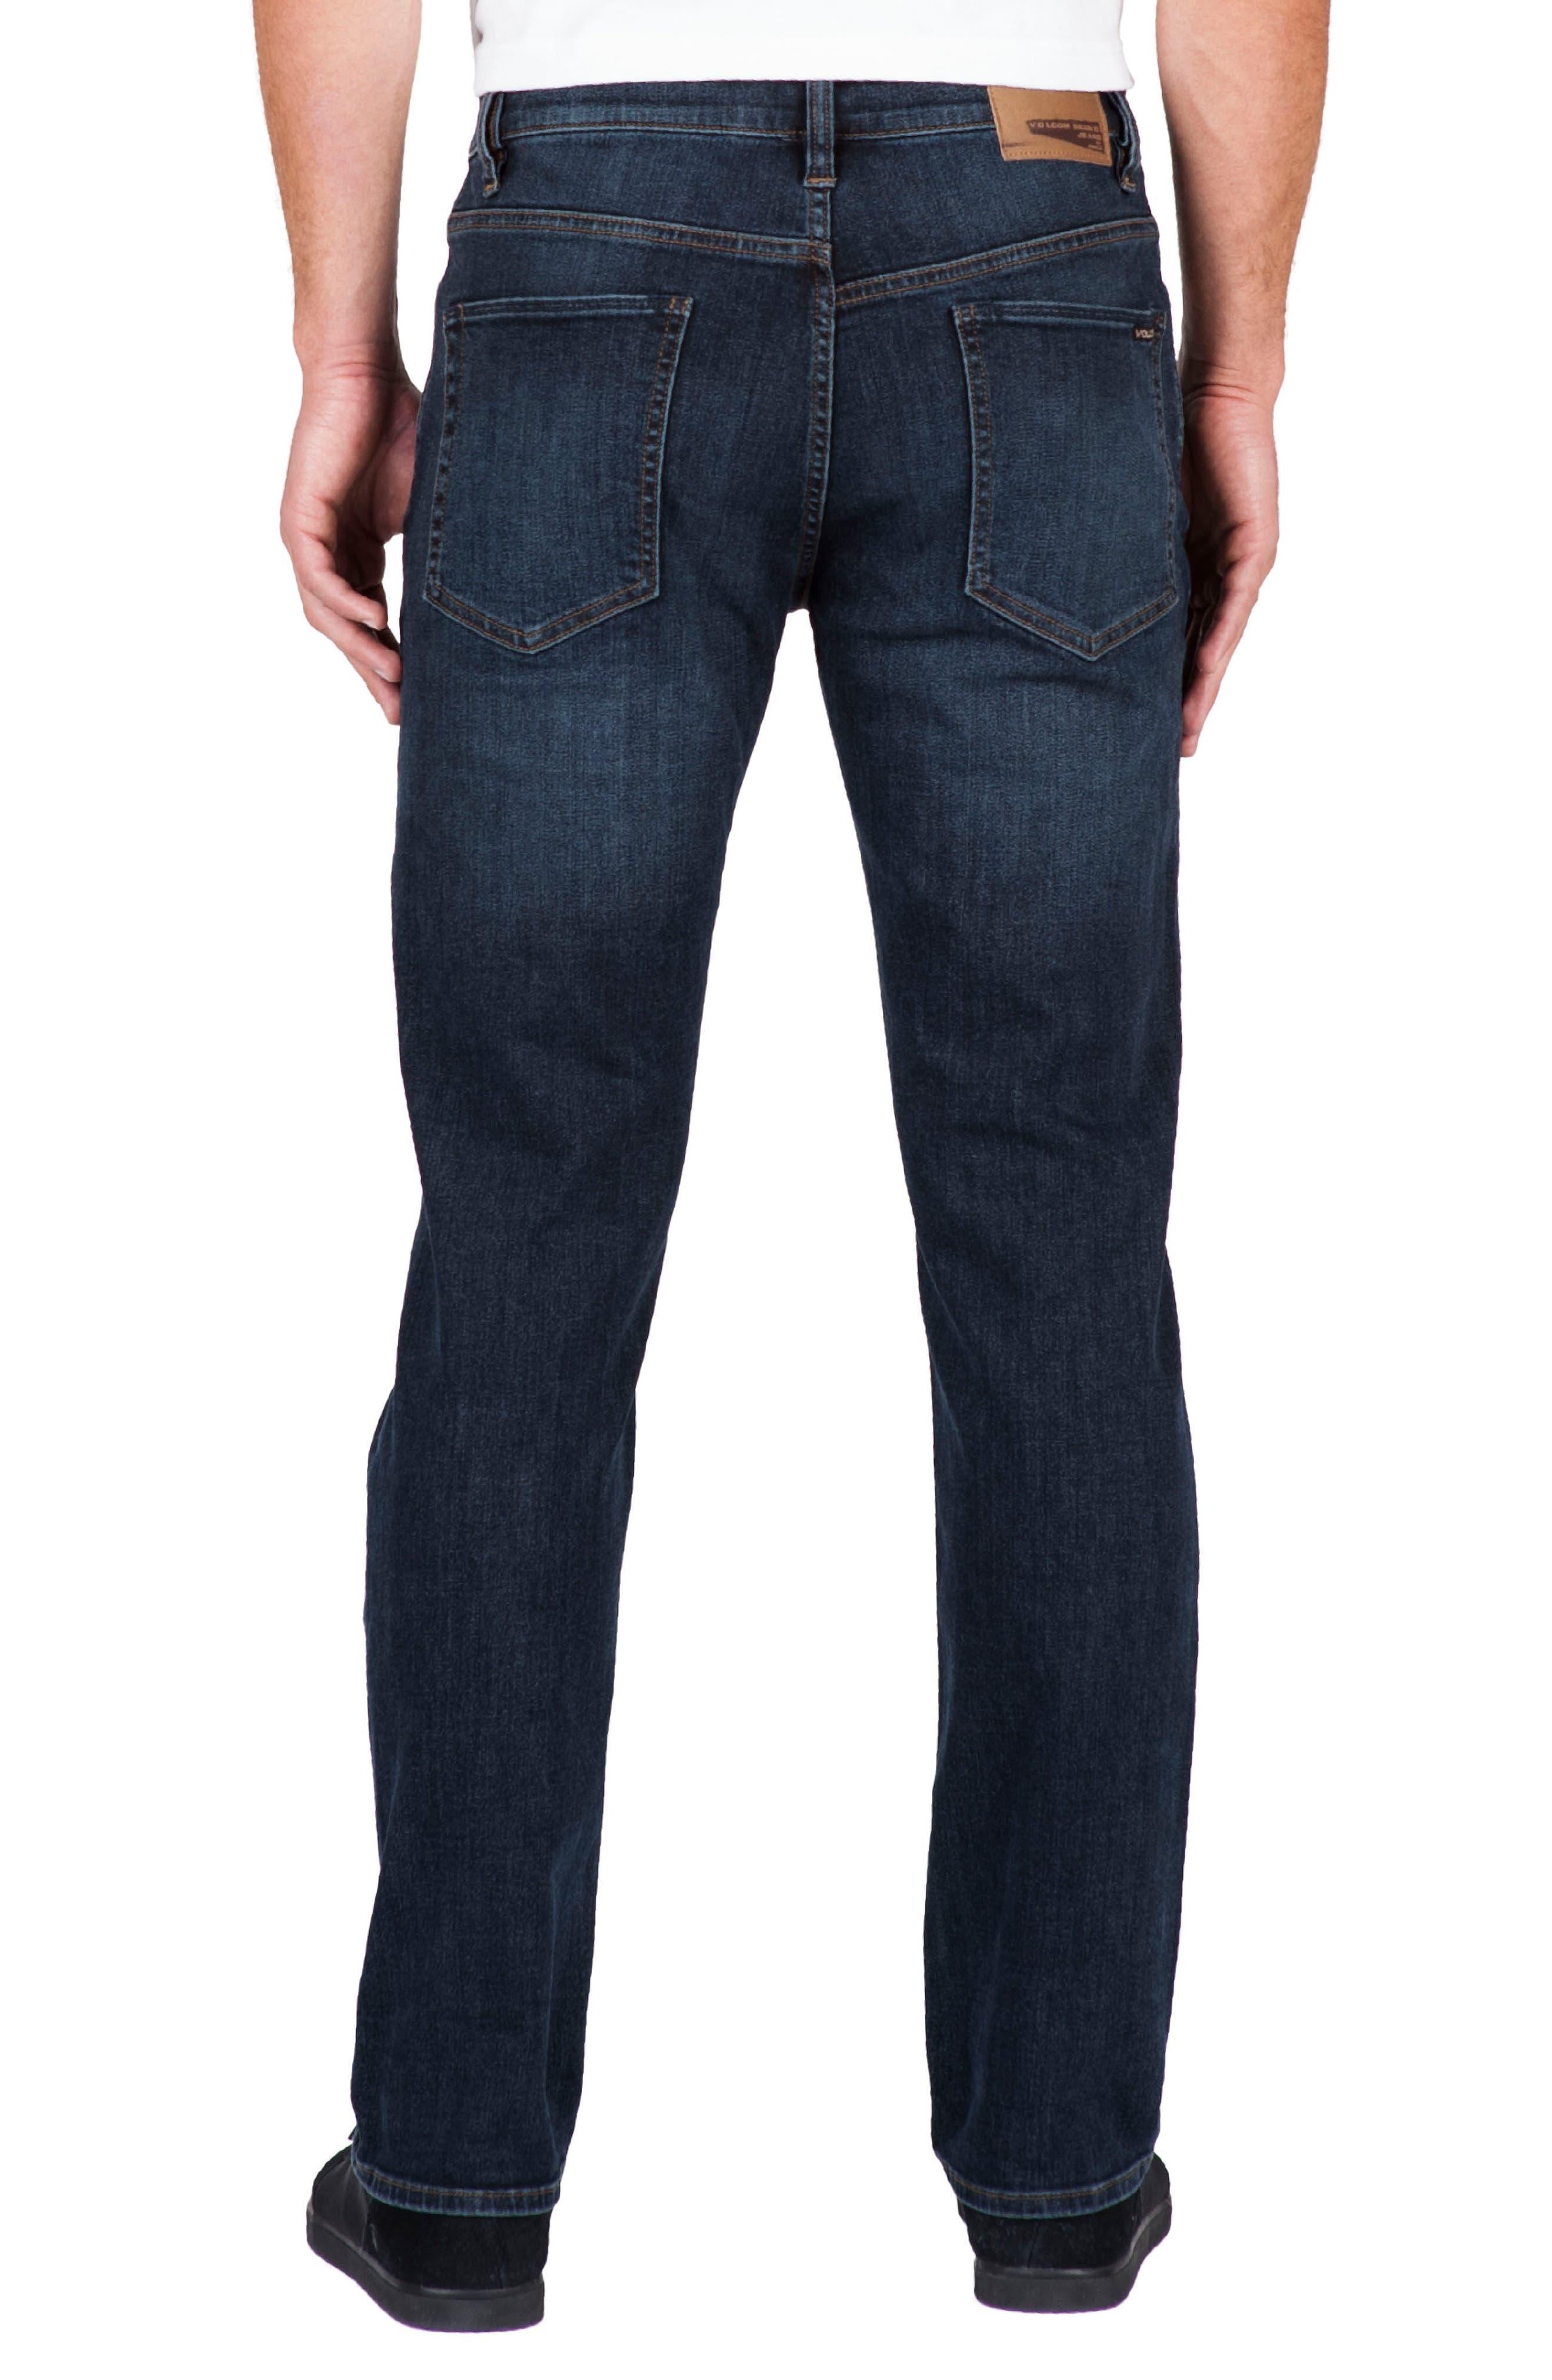 'Solver' Straight Leg Jeans,                             Alternate thumbnail 2, color,                             Blue Vnt